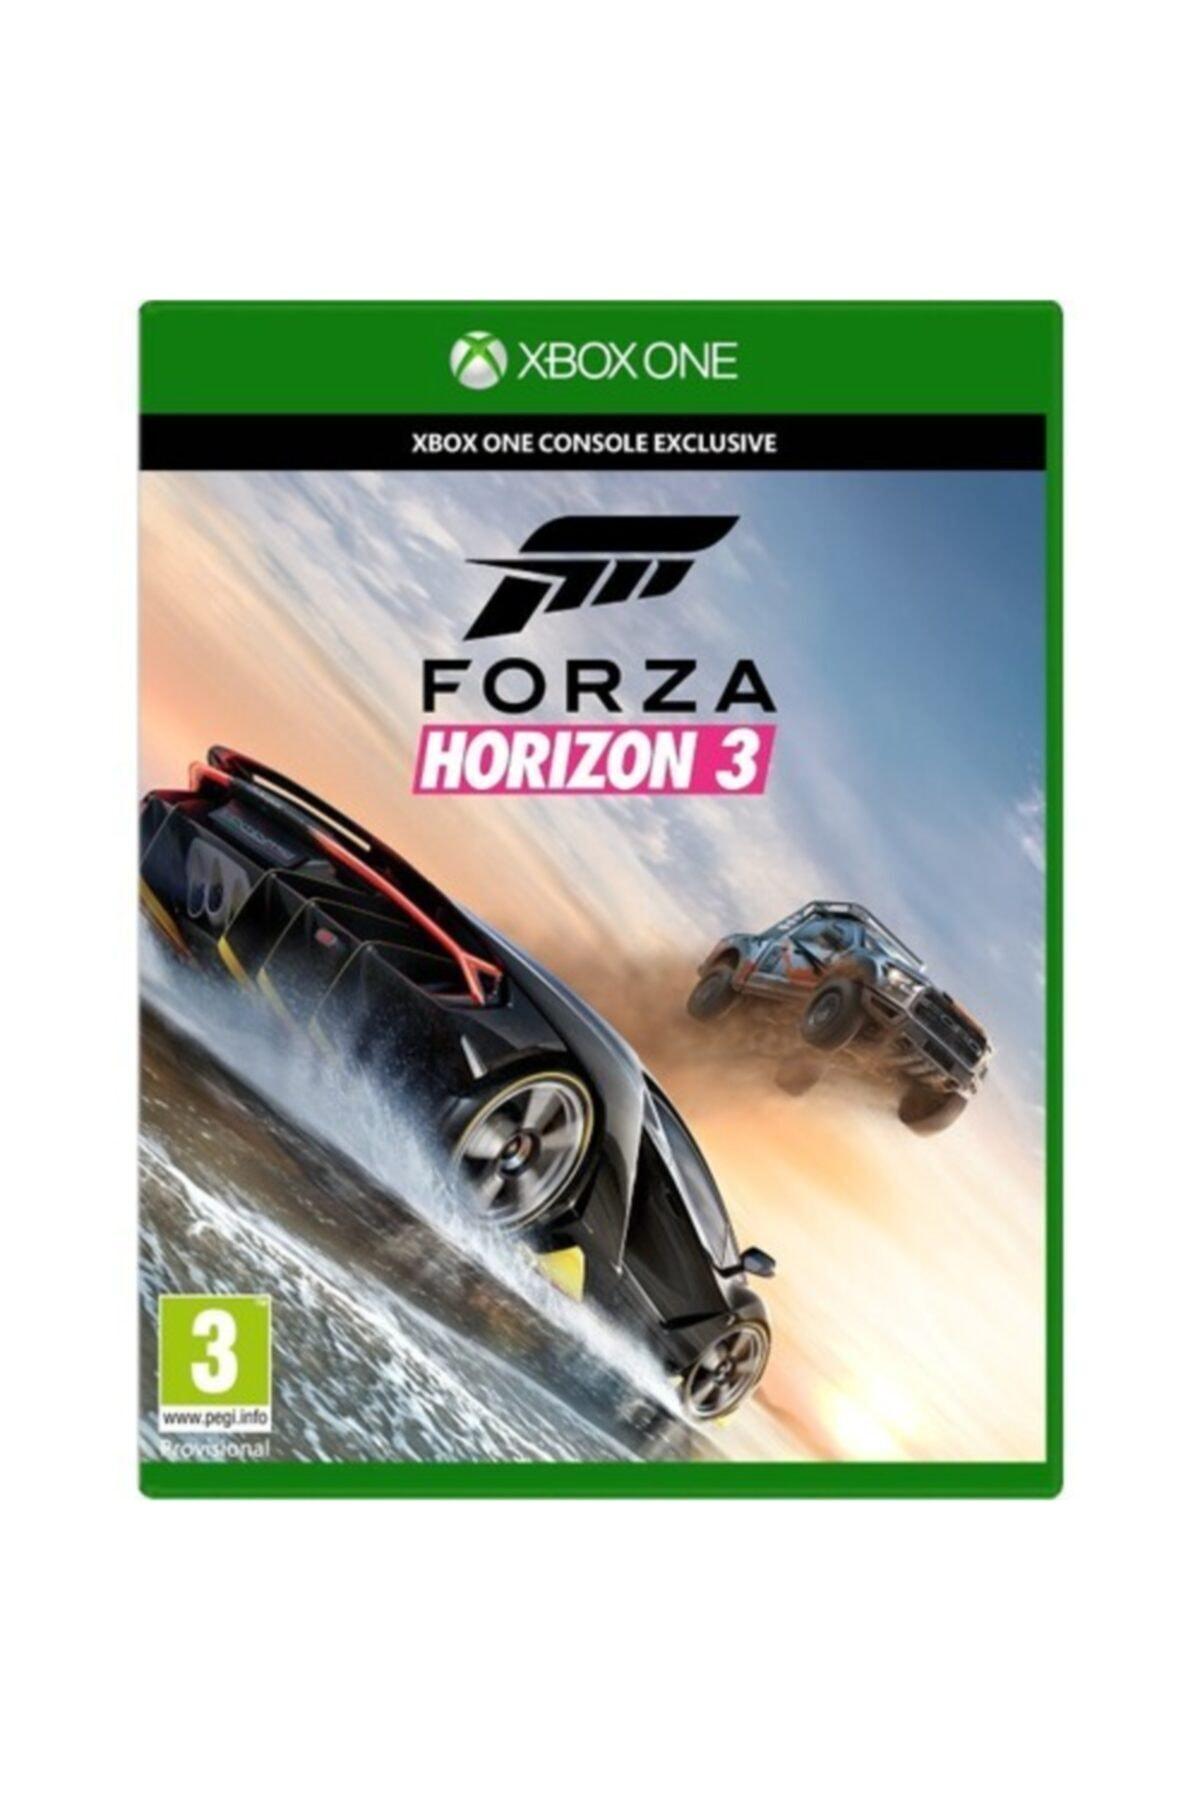 MICROSOFT Forza Horizon 3 Xbox One 1